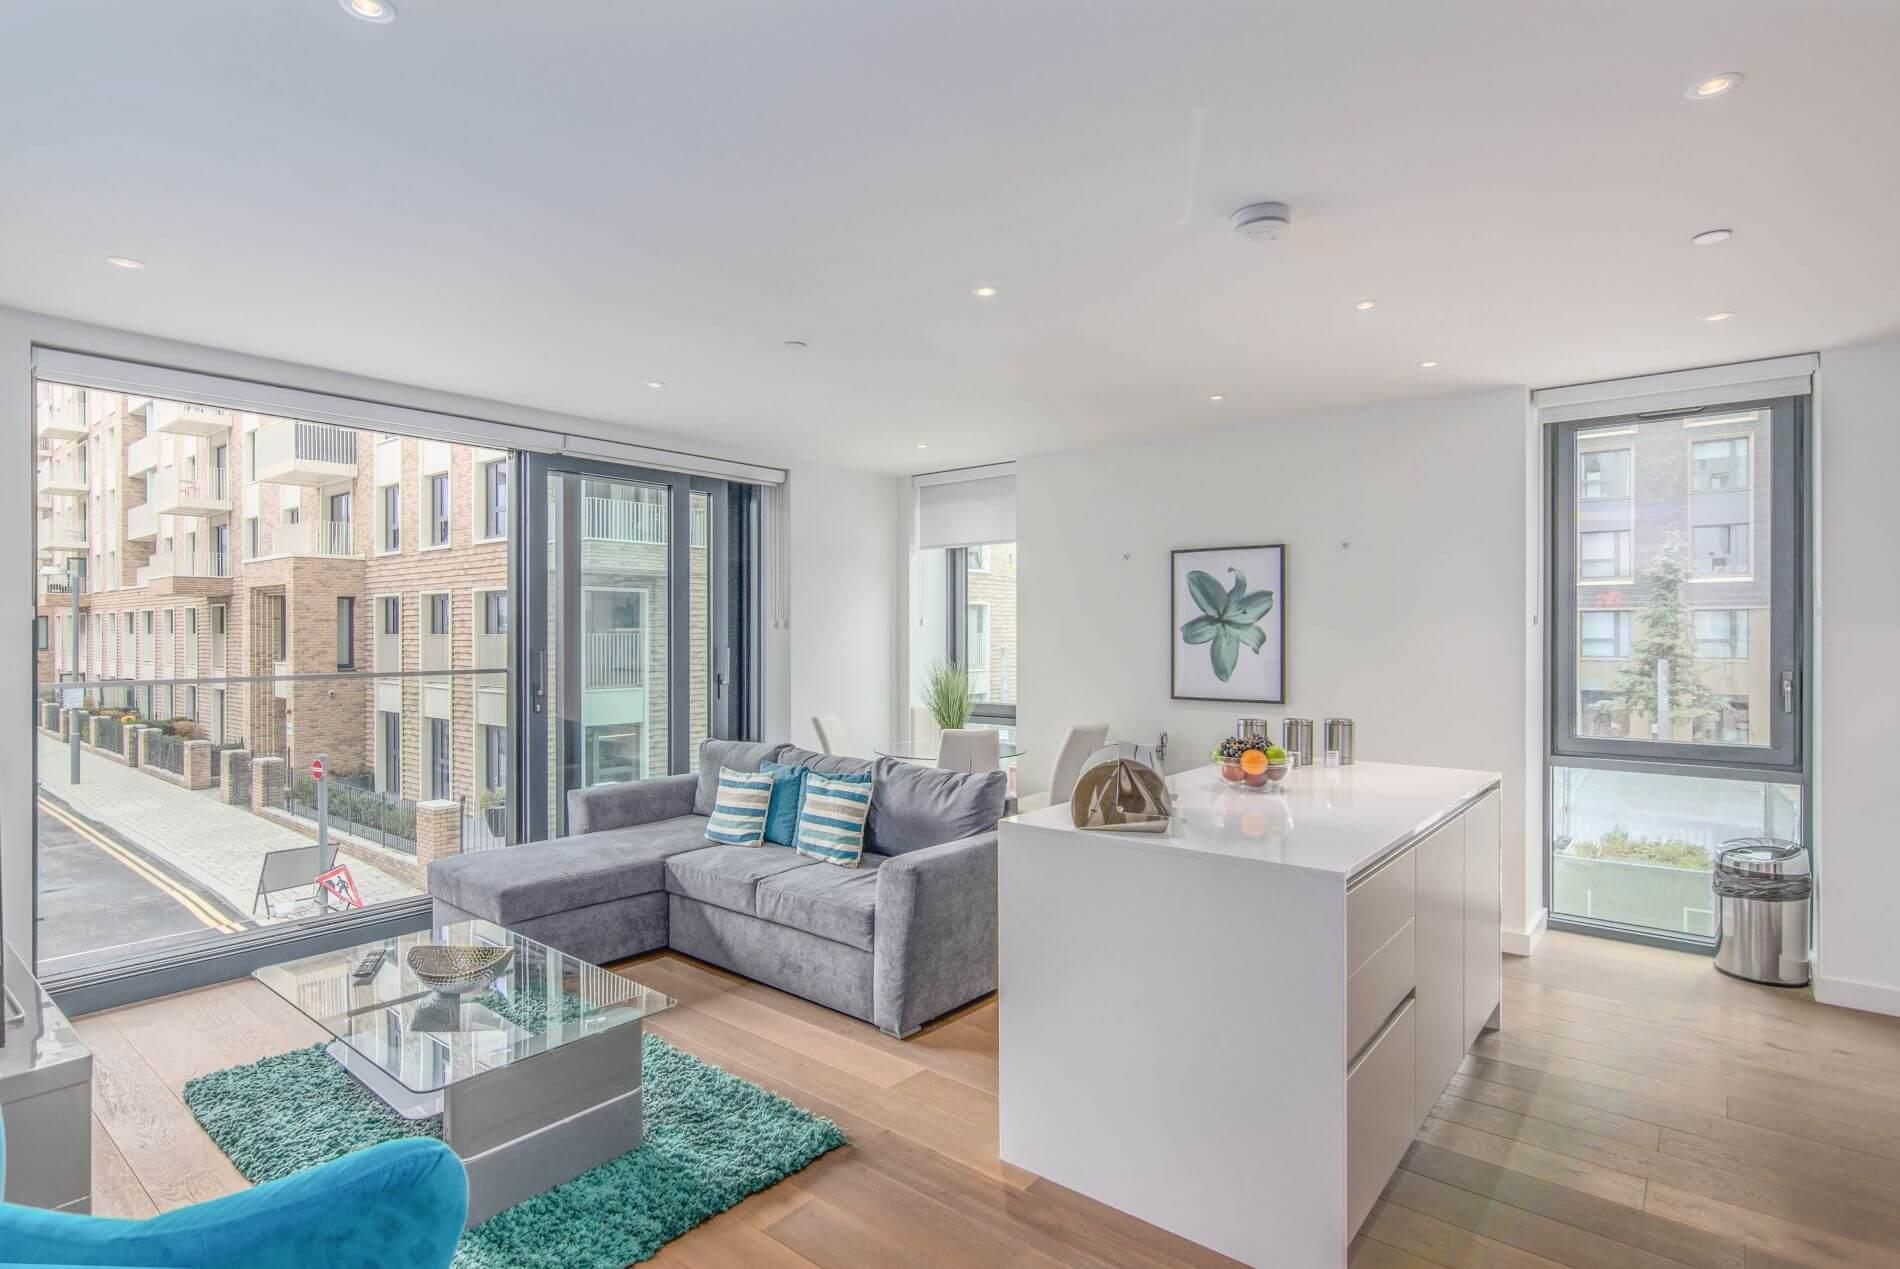 Furnished luxury flat in Wembley